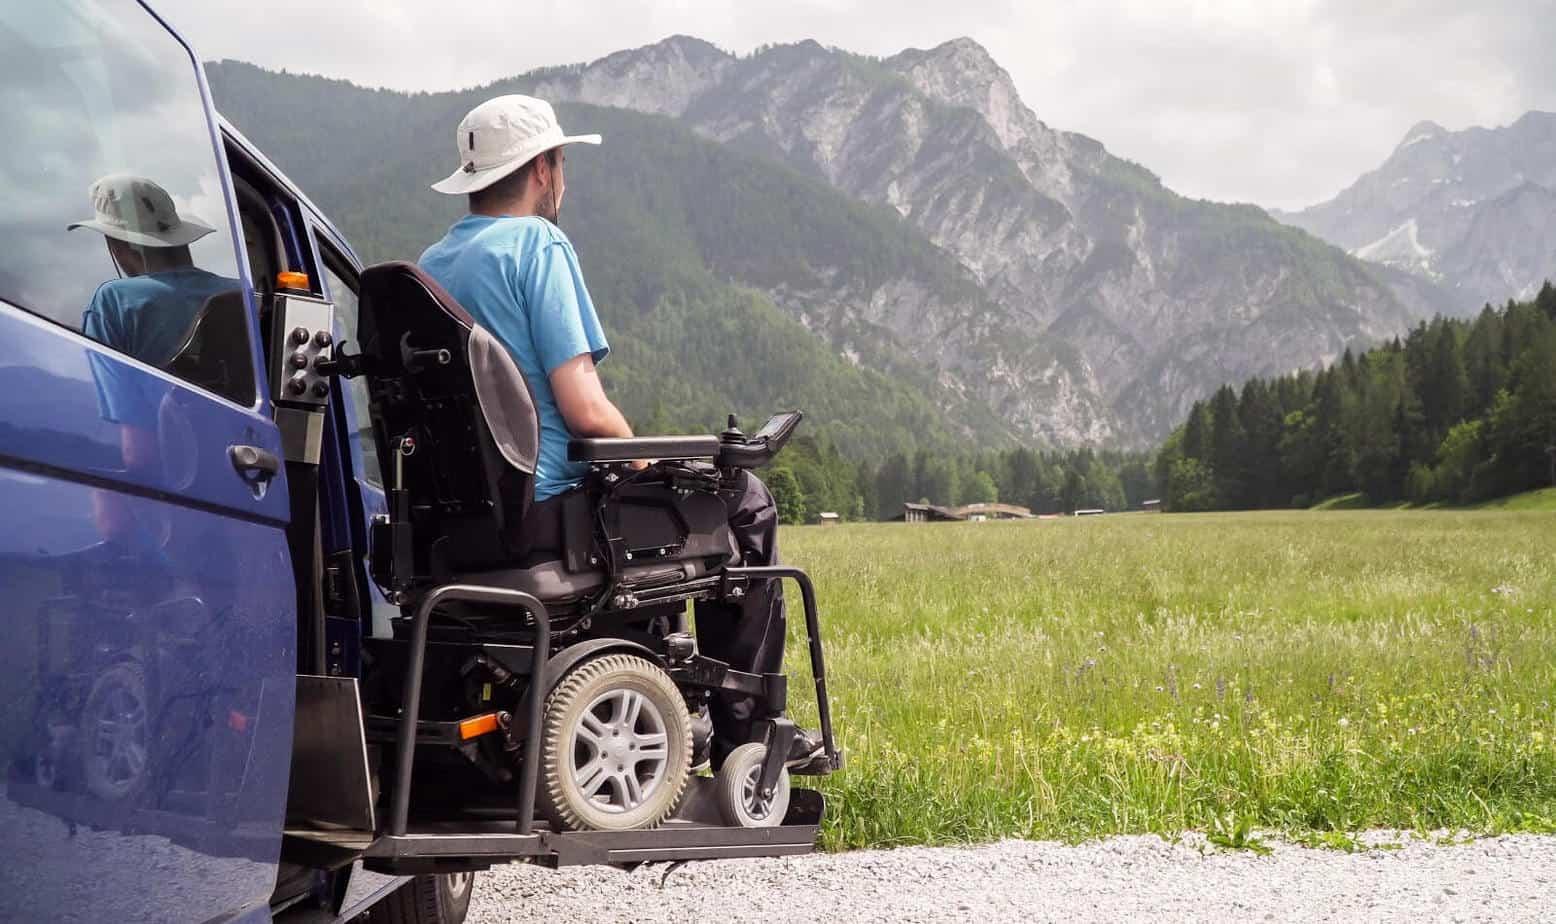 A man enjoying nature in a wheelchair.